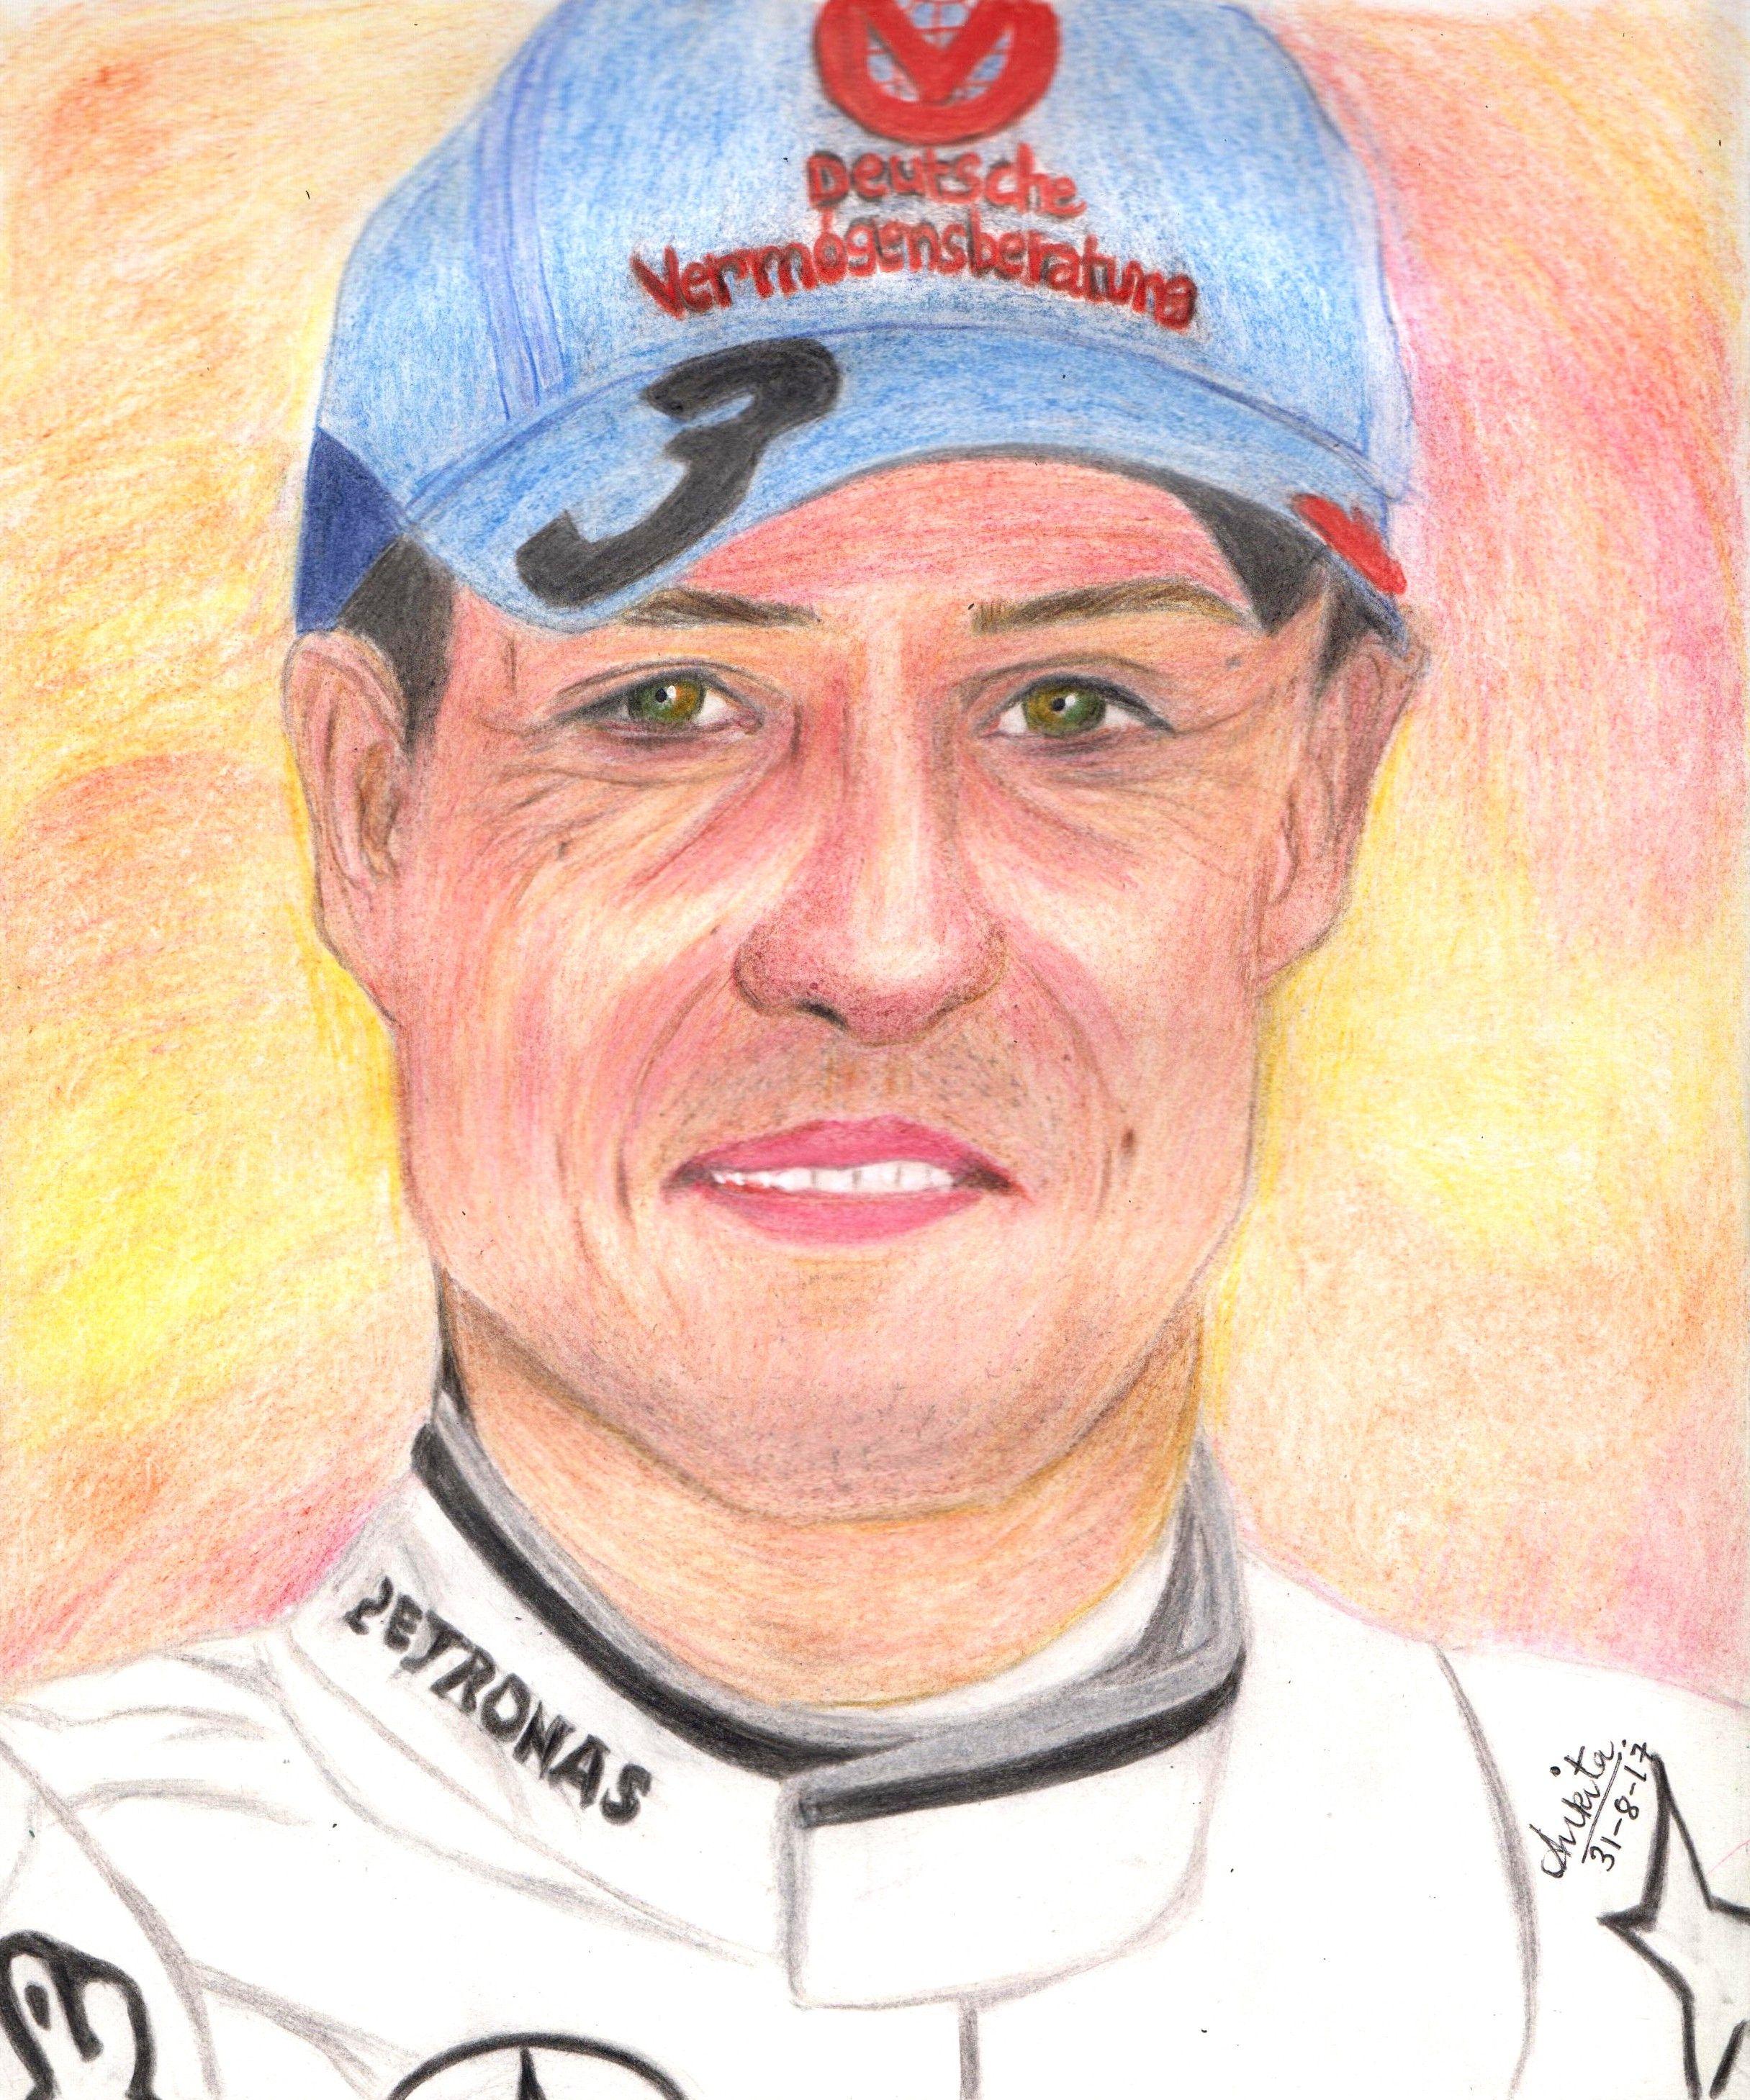 Wishing Michael Schumacher a speedy recovery